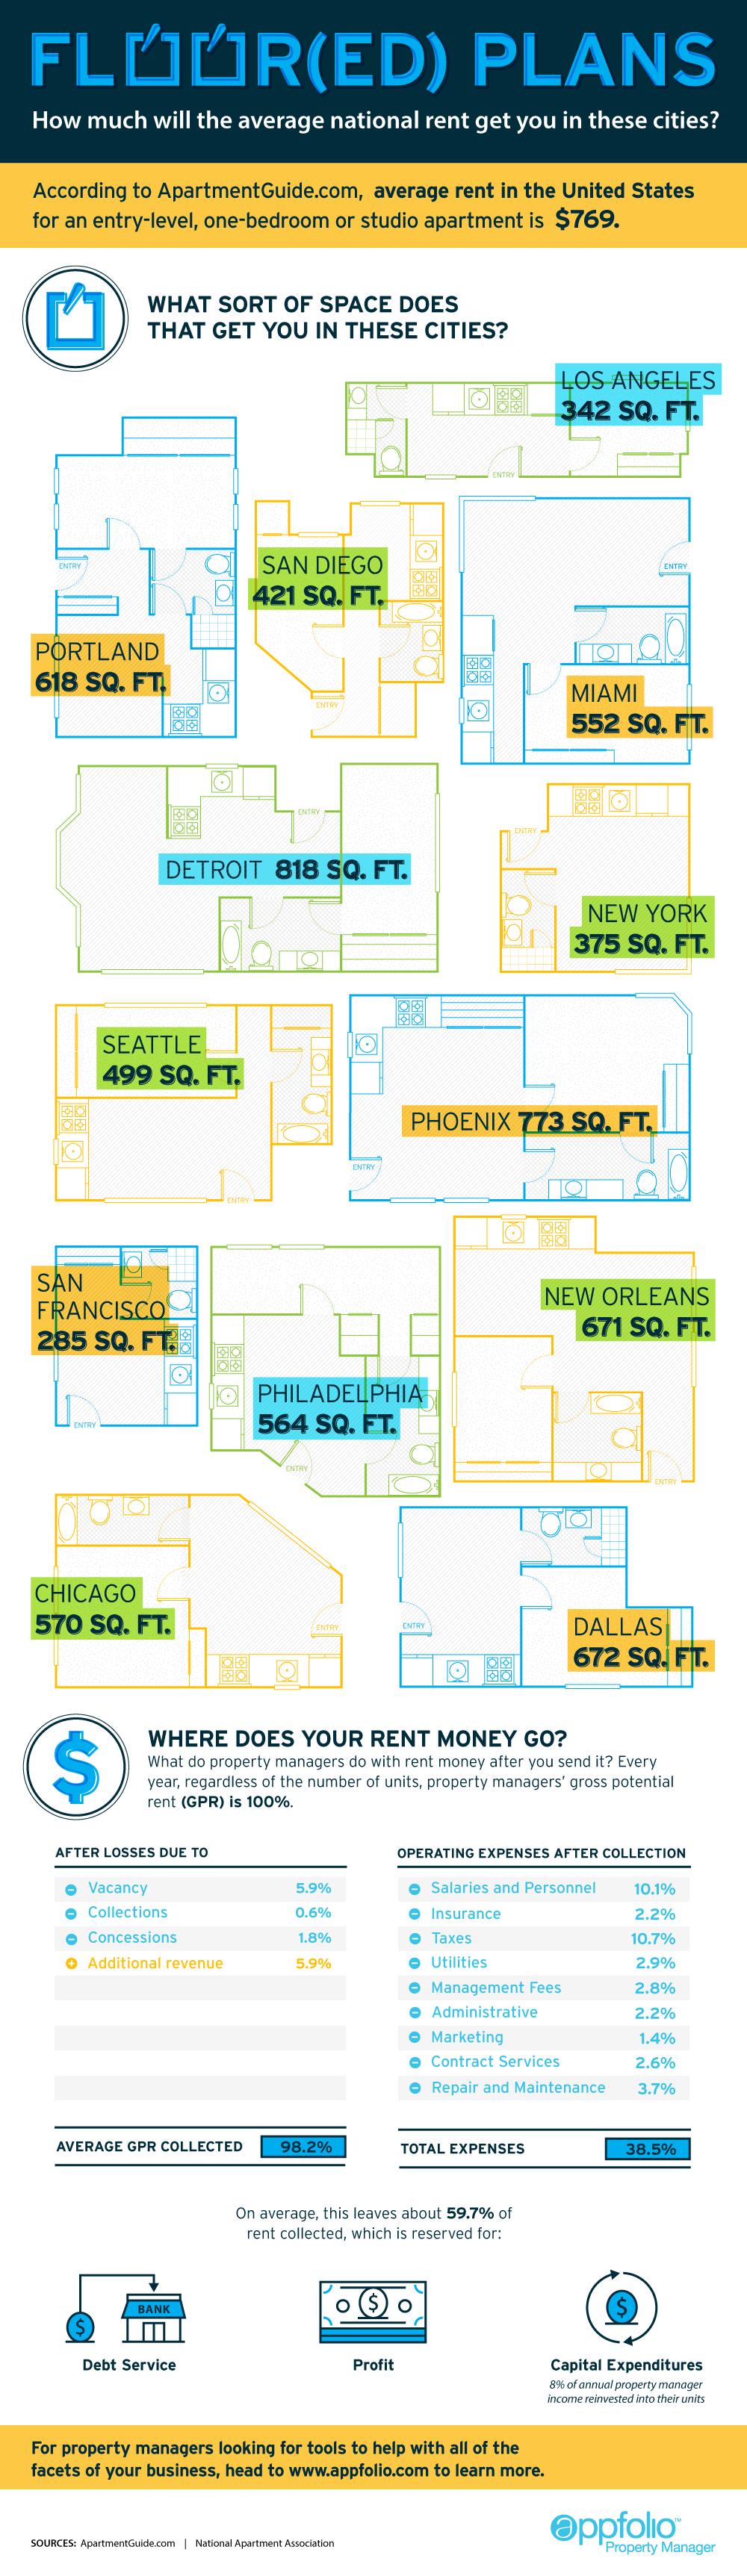 Floor(ed) Plans